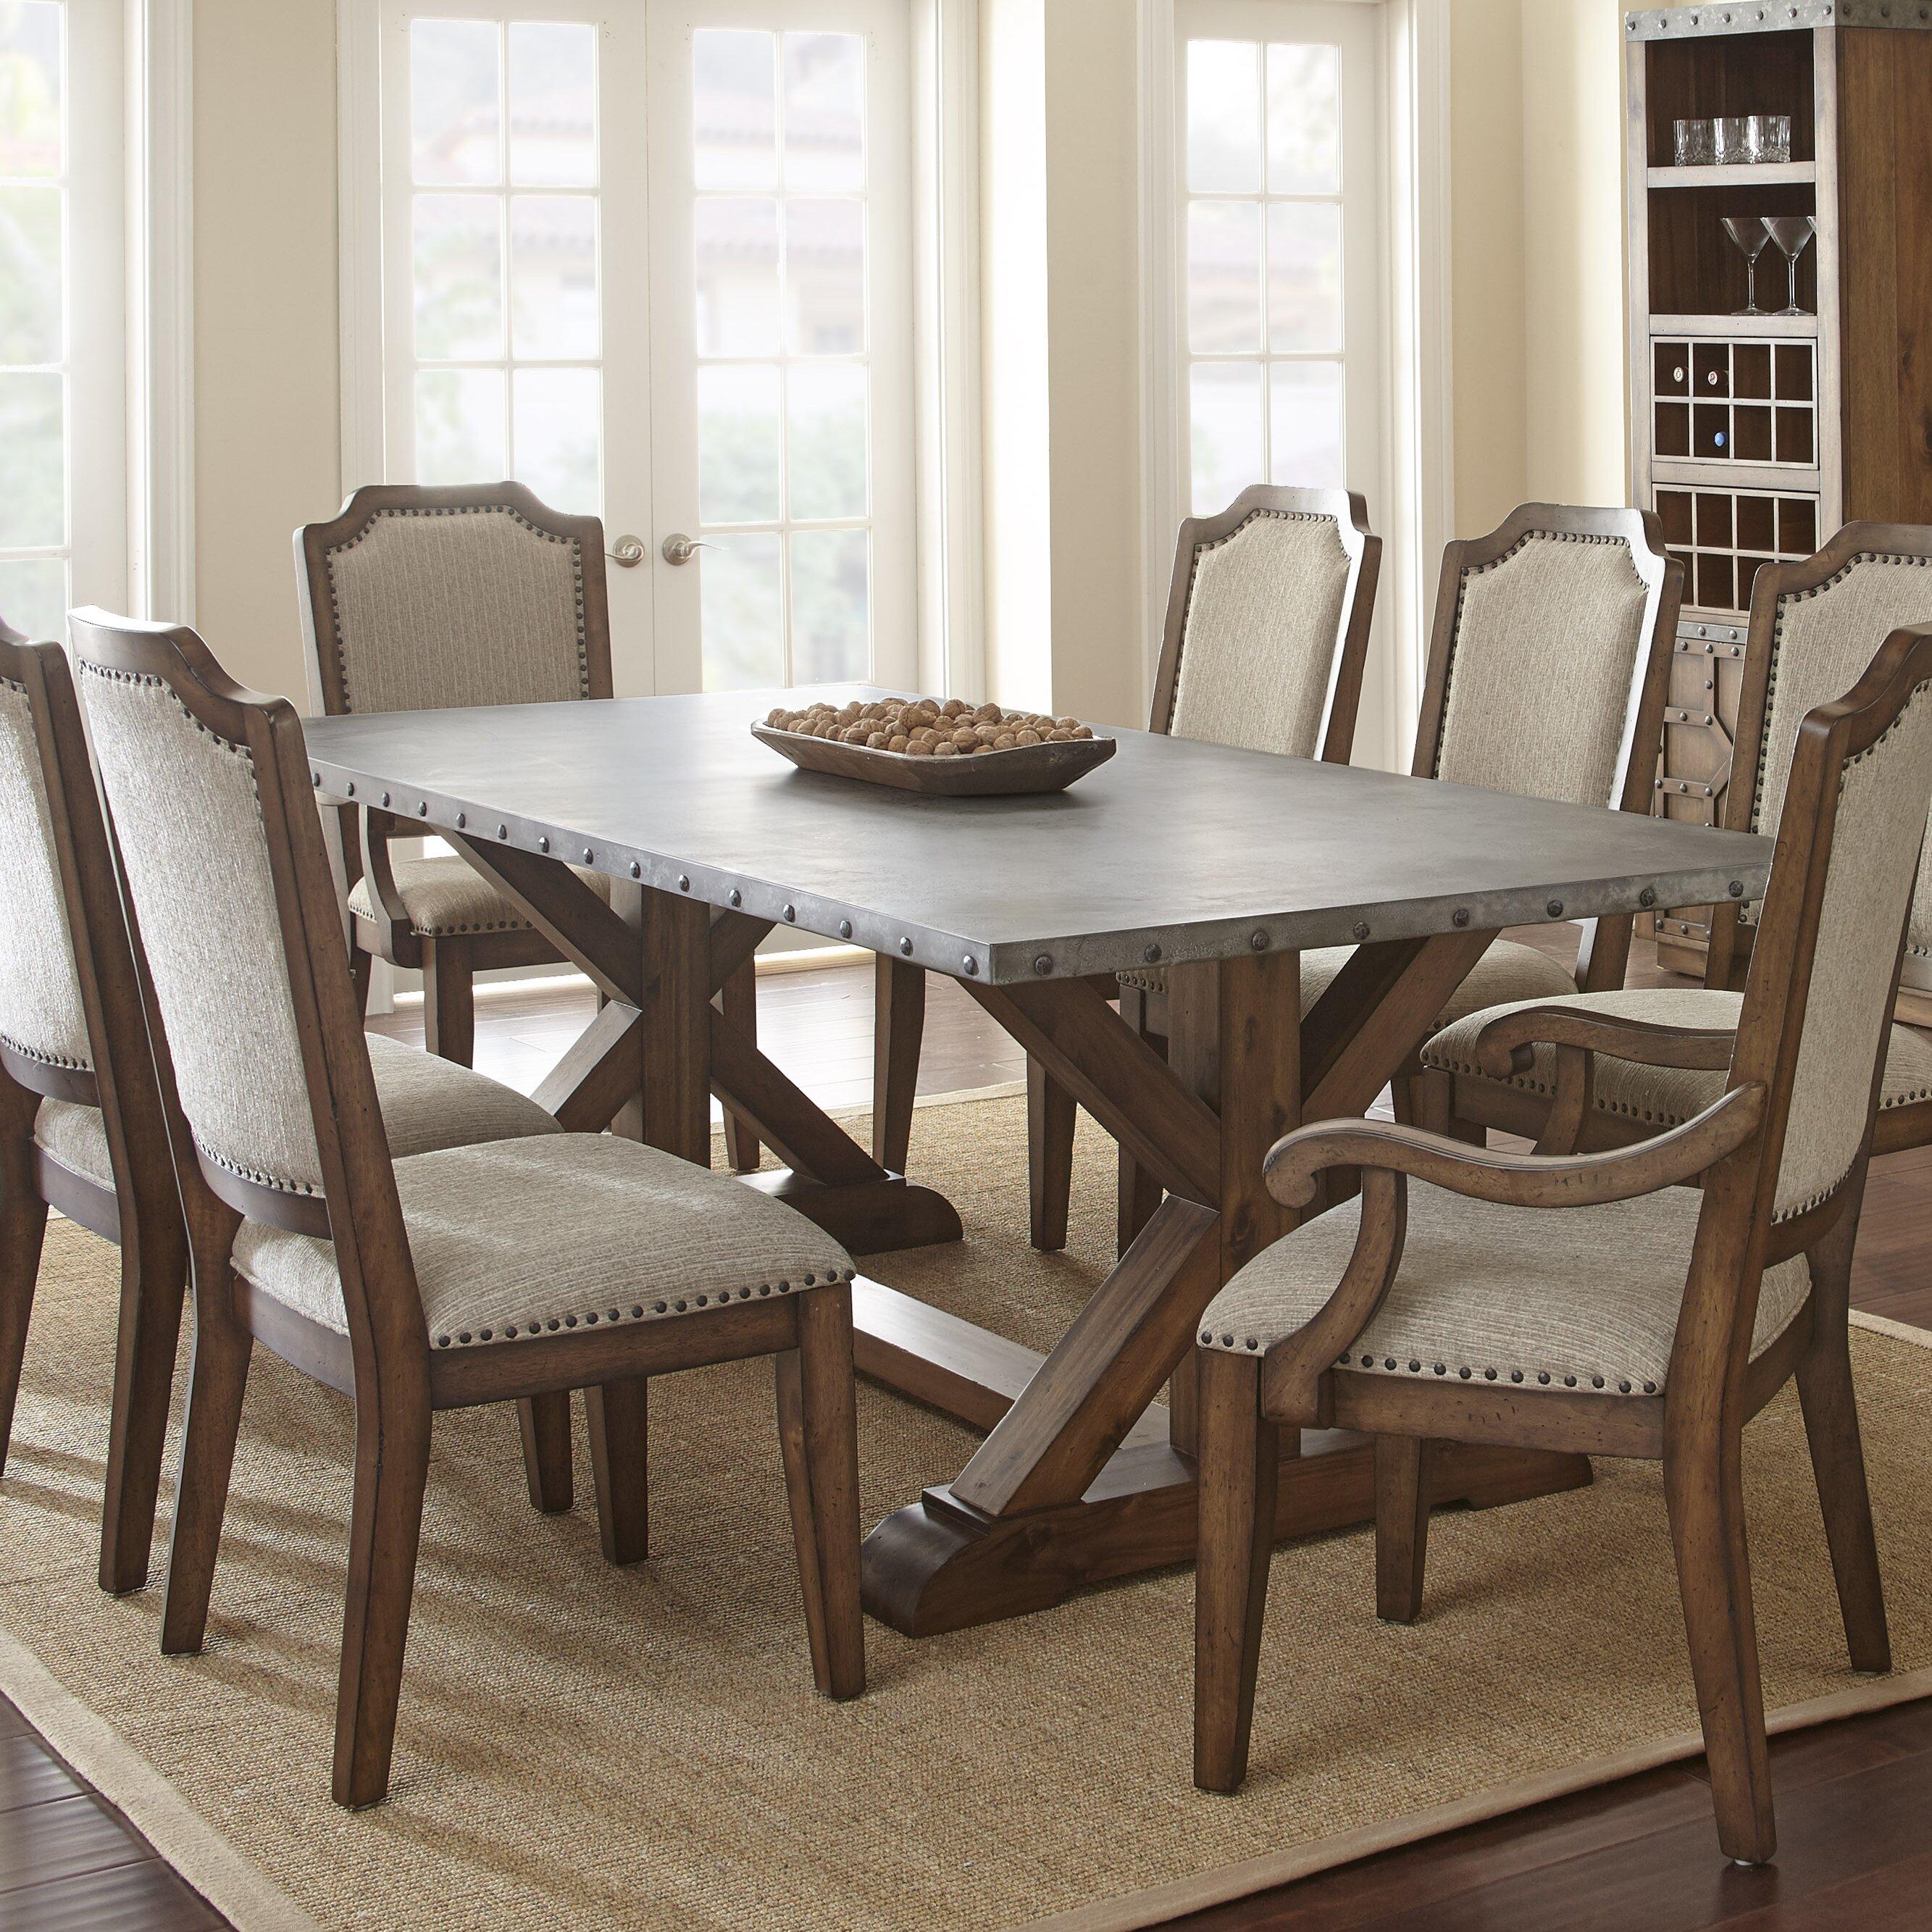 trent austin design cushing 9 piece dining set reviews